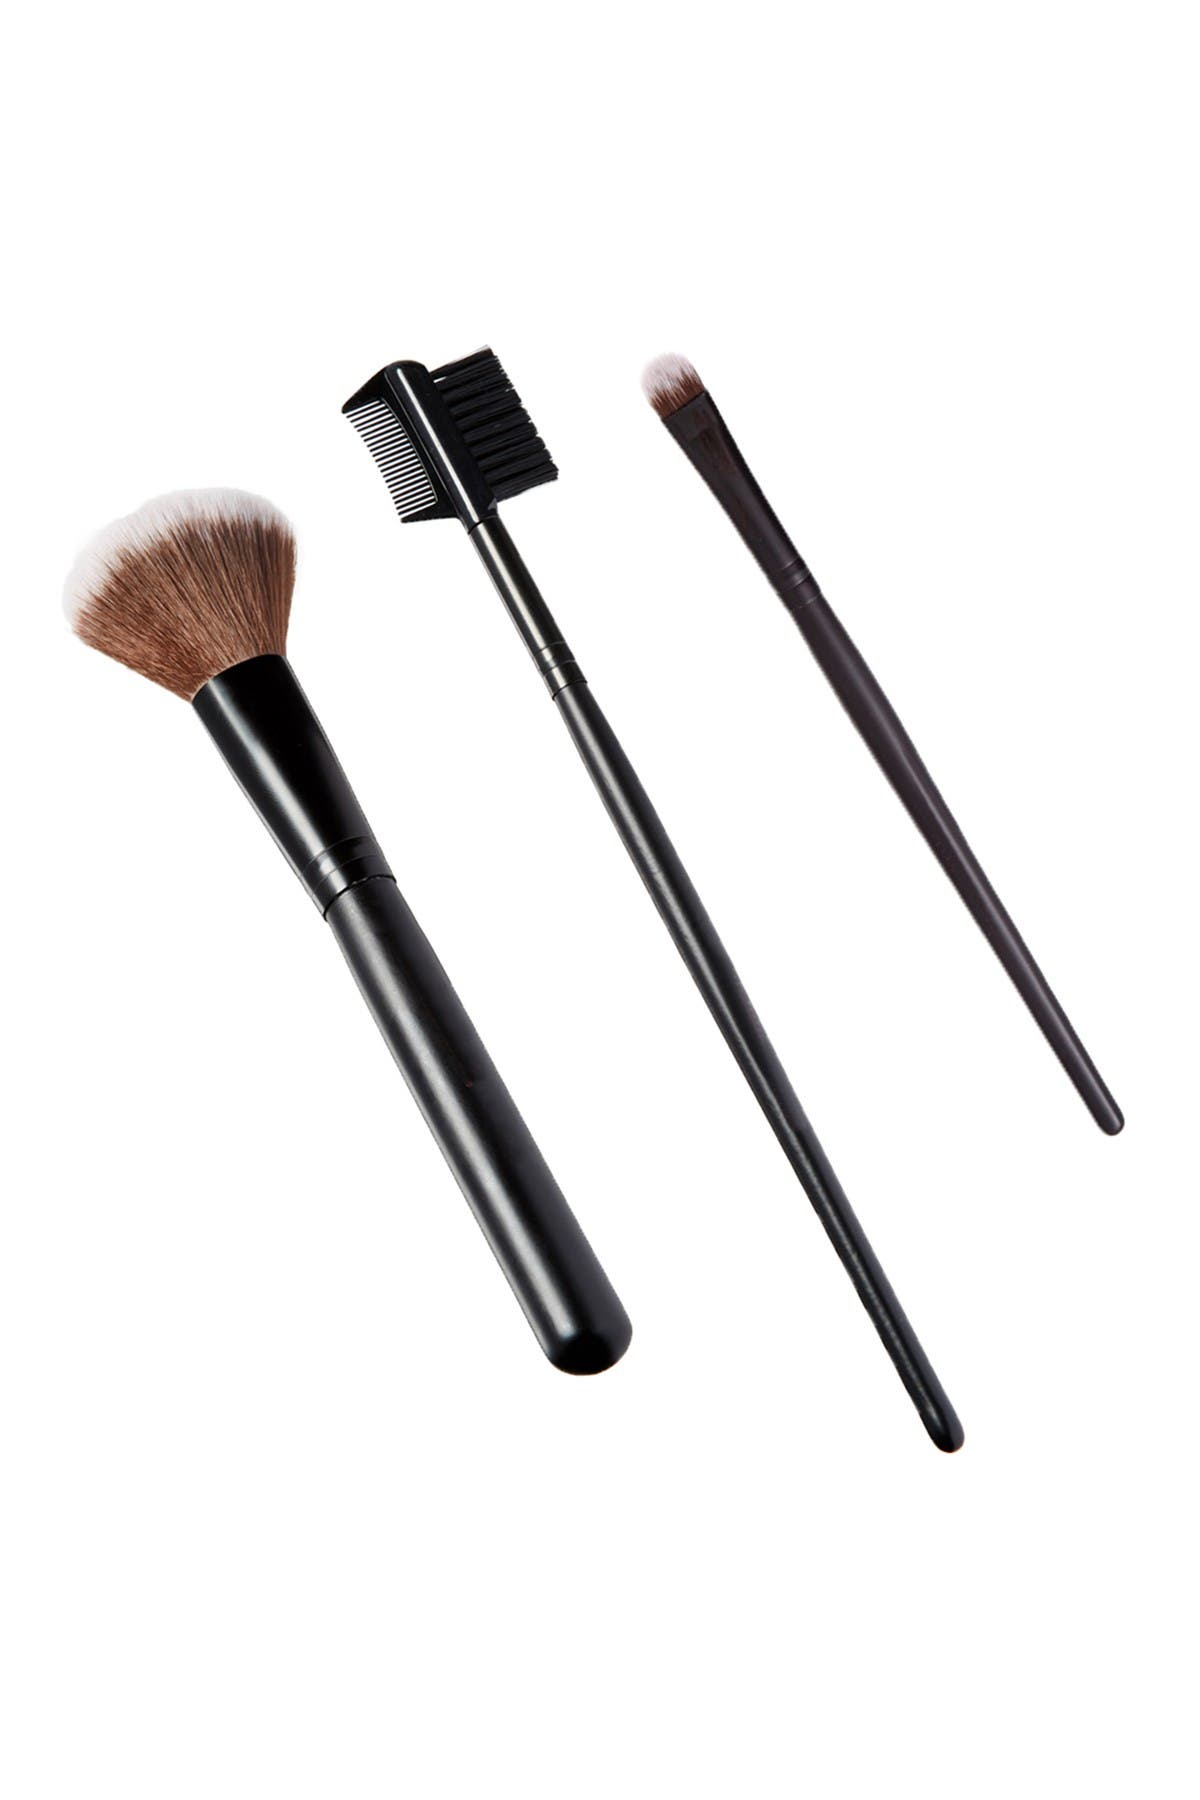 Glamour Status The Essentials 3-Piece Makeup Brush Set